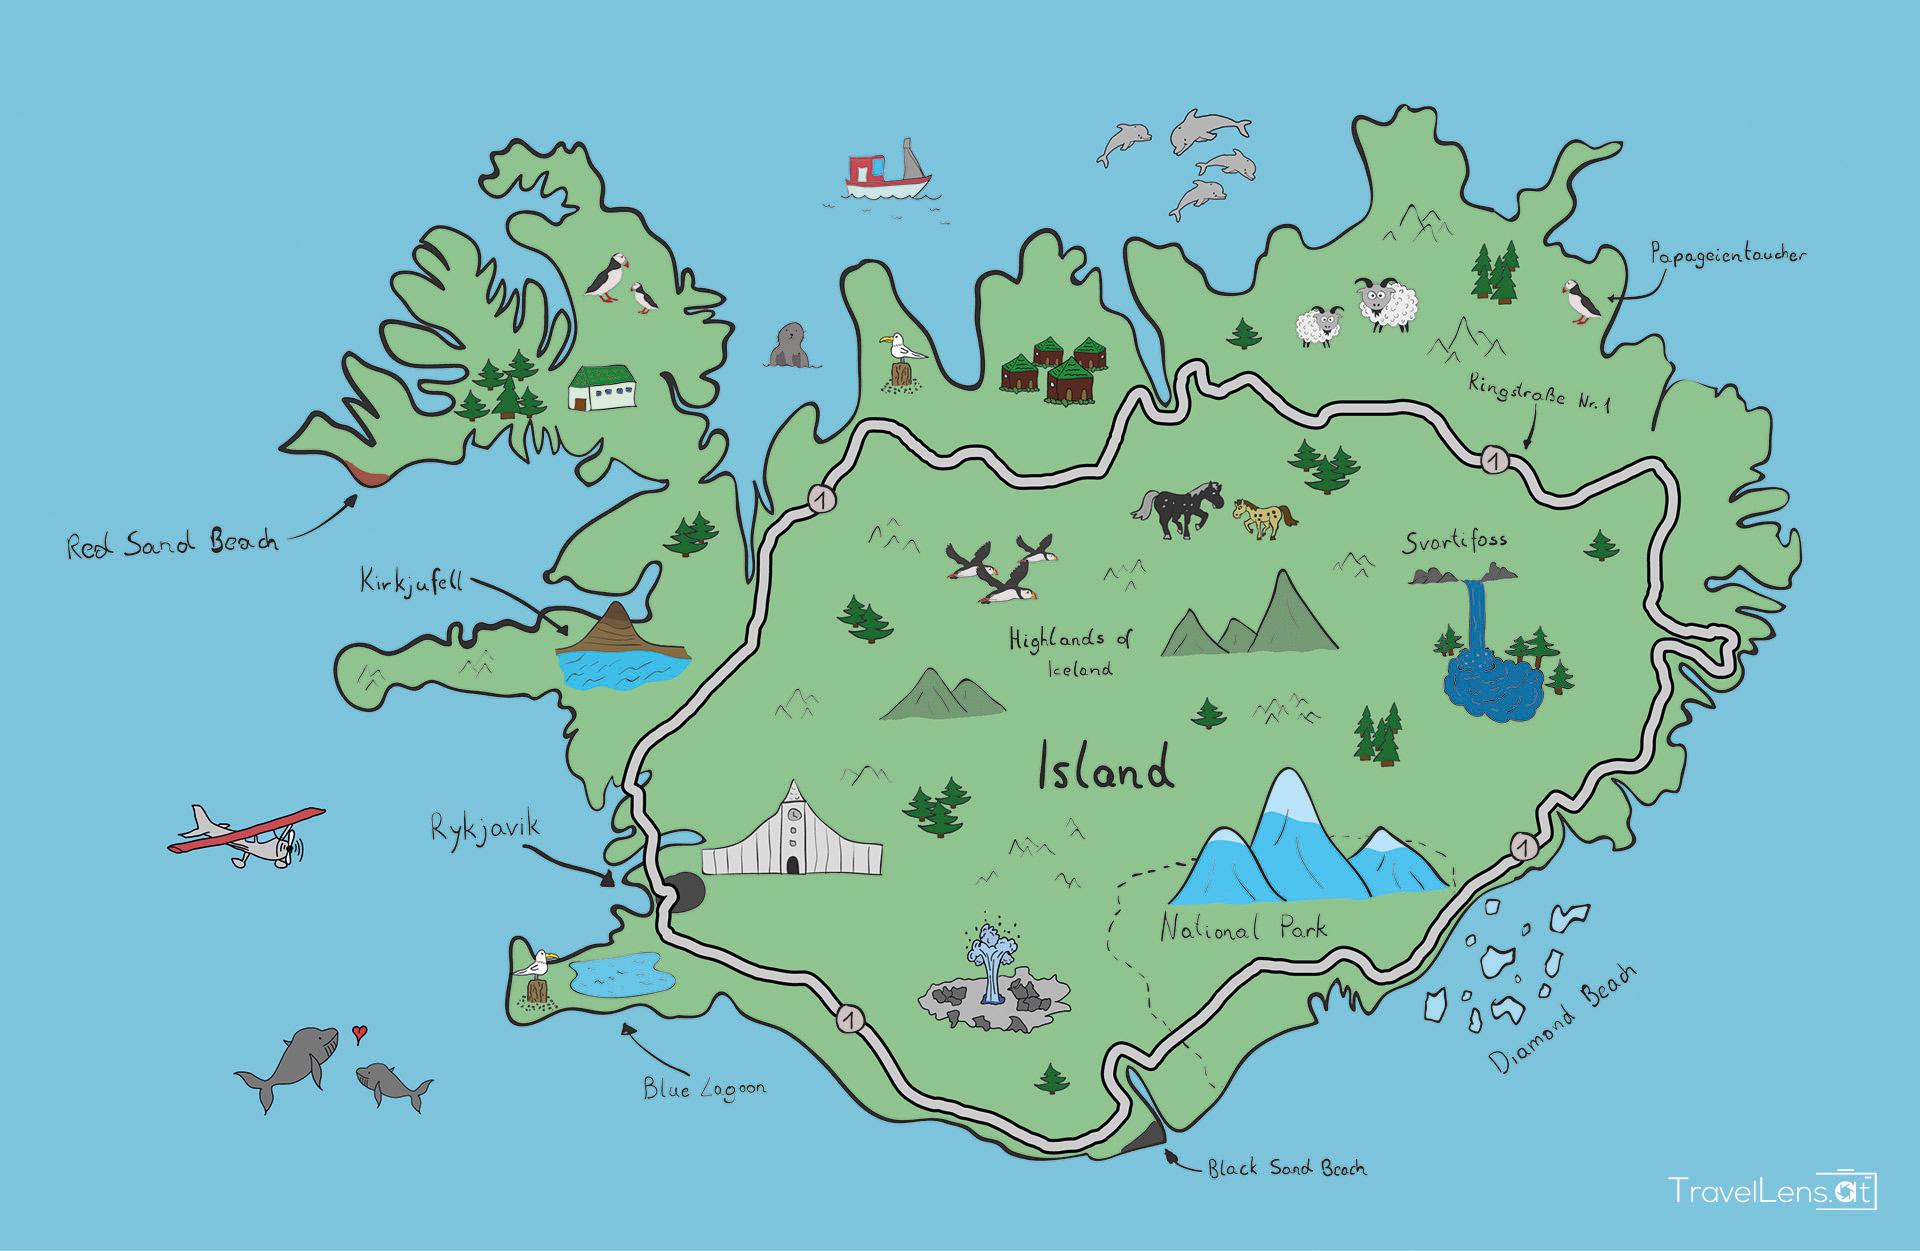 Karte Island Flugzeugwrack.Island 2019 Travellens At